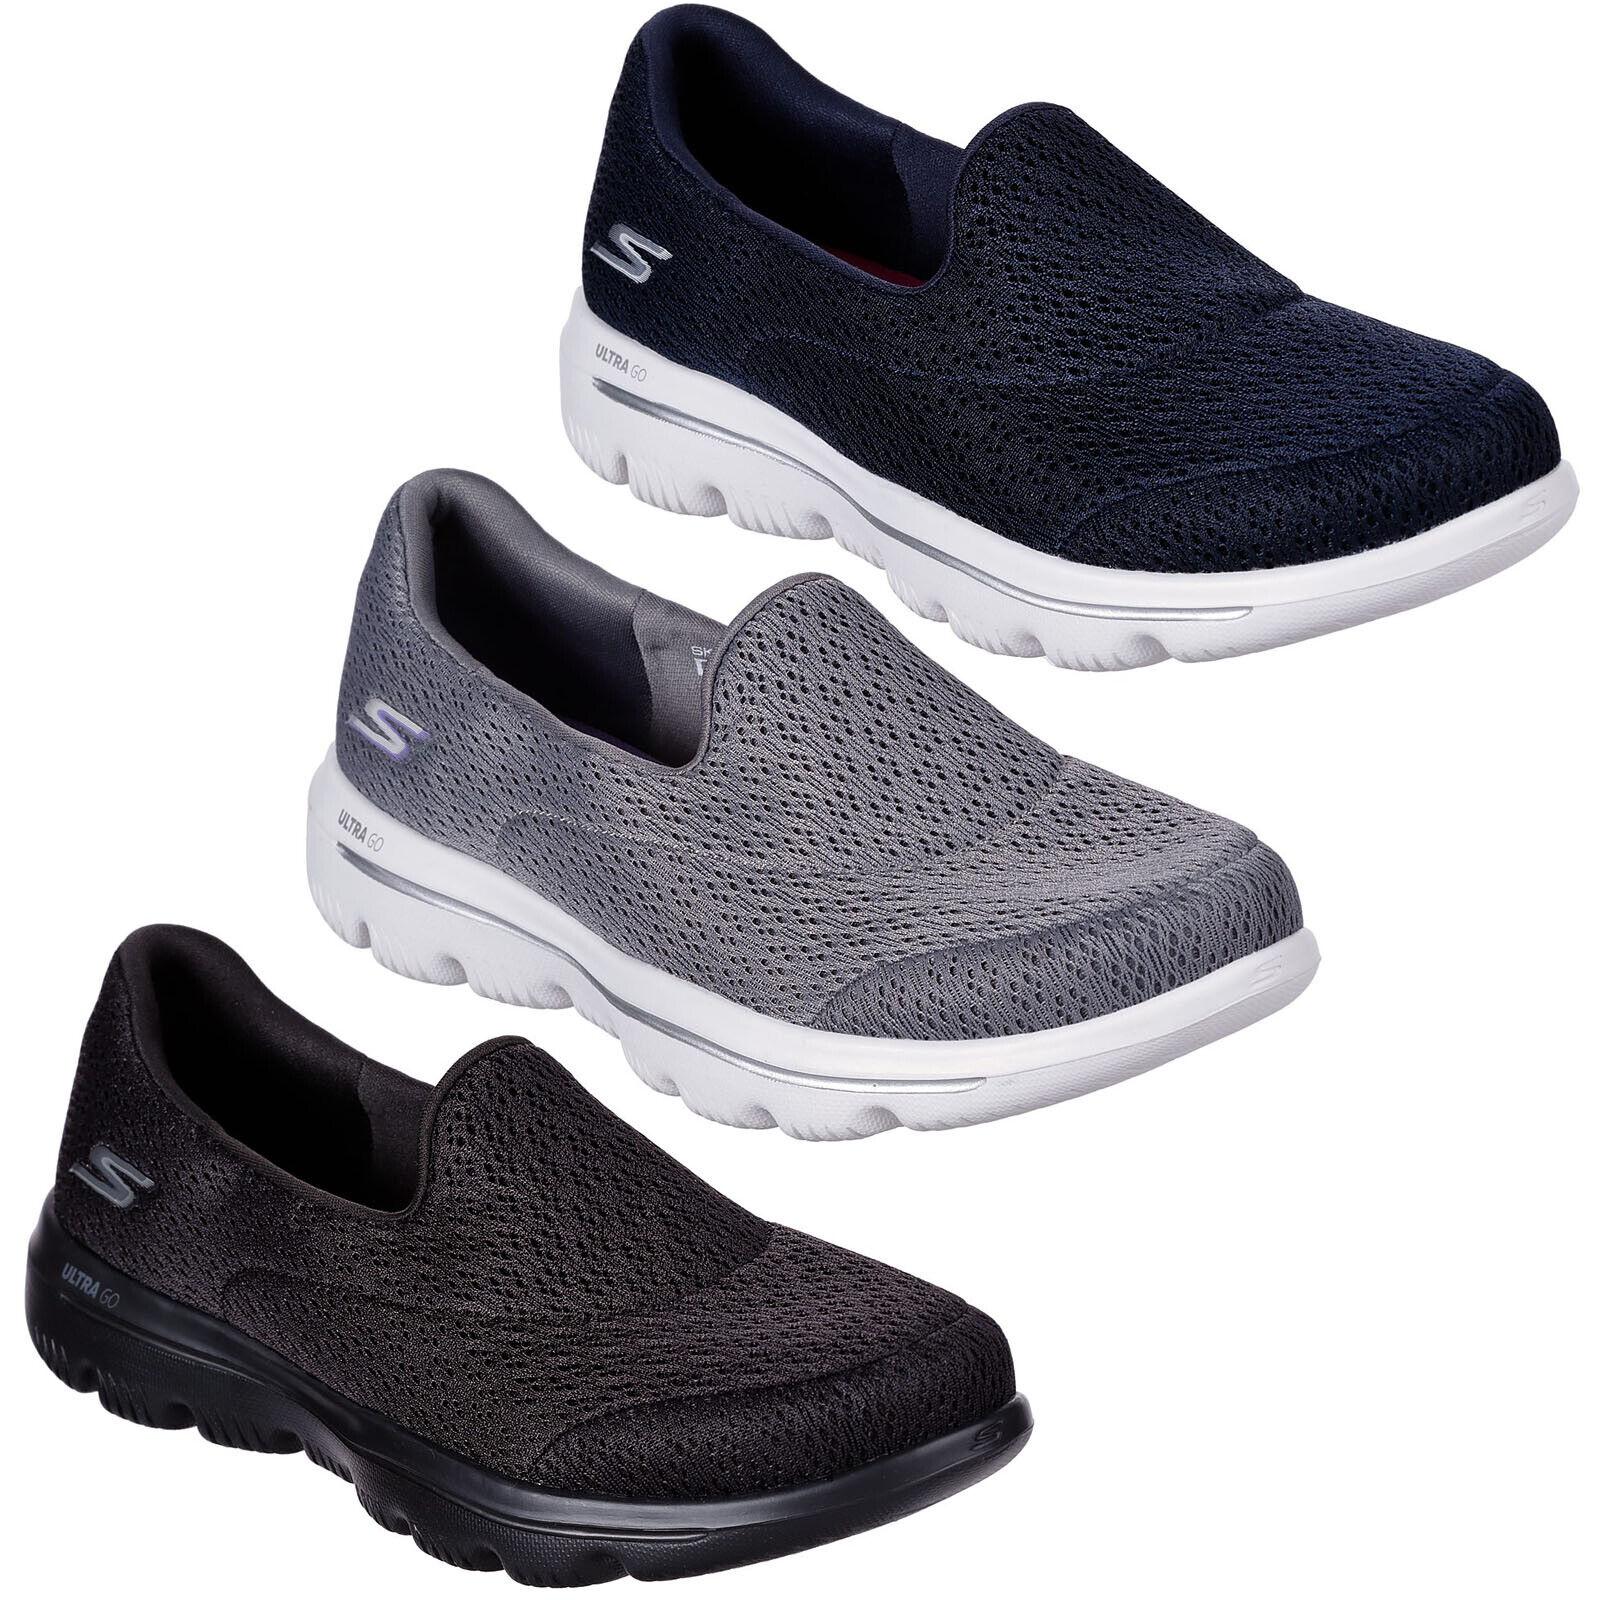 Skechers GoWalk Evolution Ultra - Persist Trainers 15738 Womens Lightweight shoes